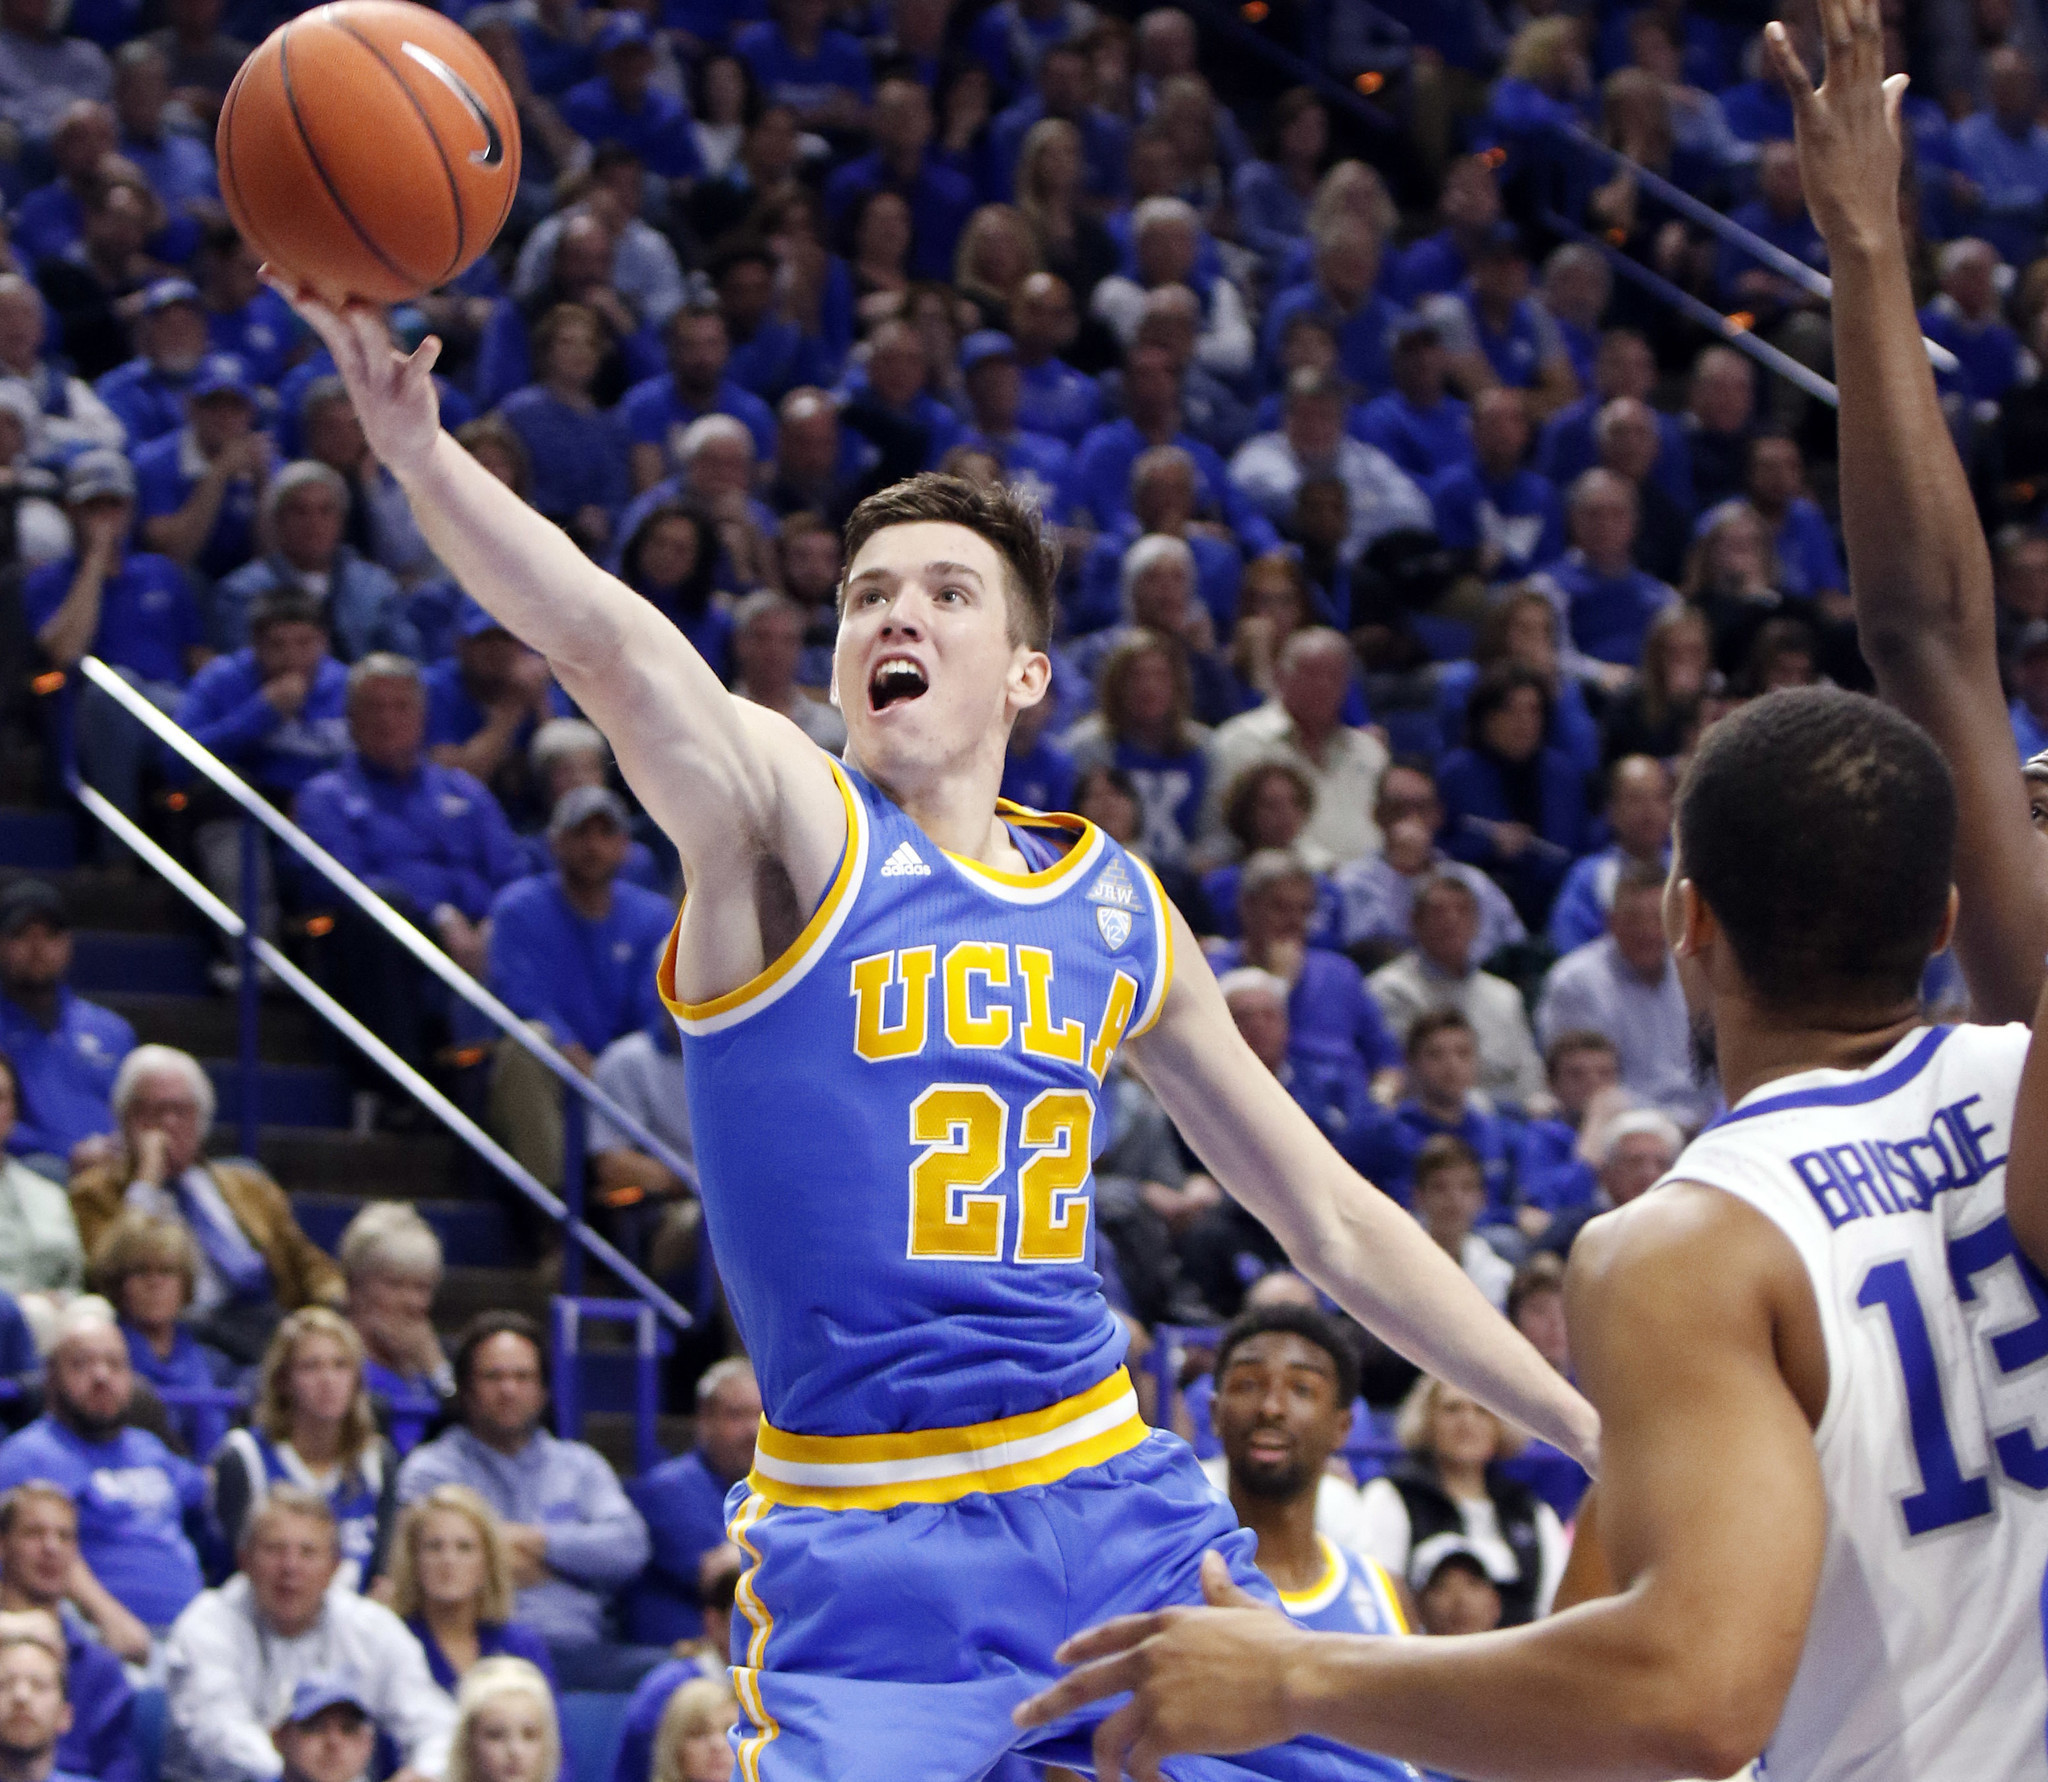 The Buzz Around The Unbeaten UCLA Basketball Team Is